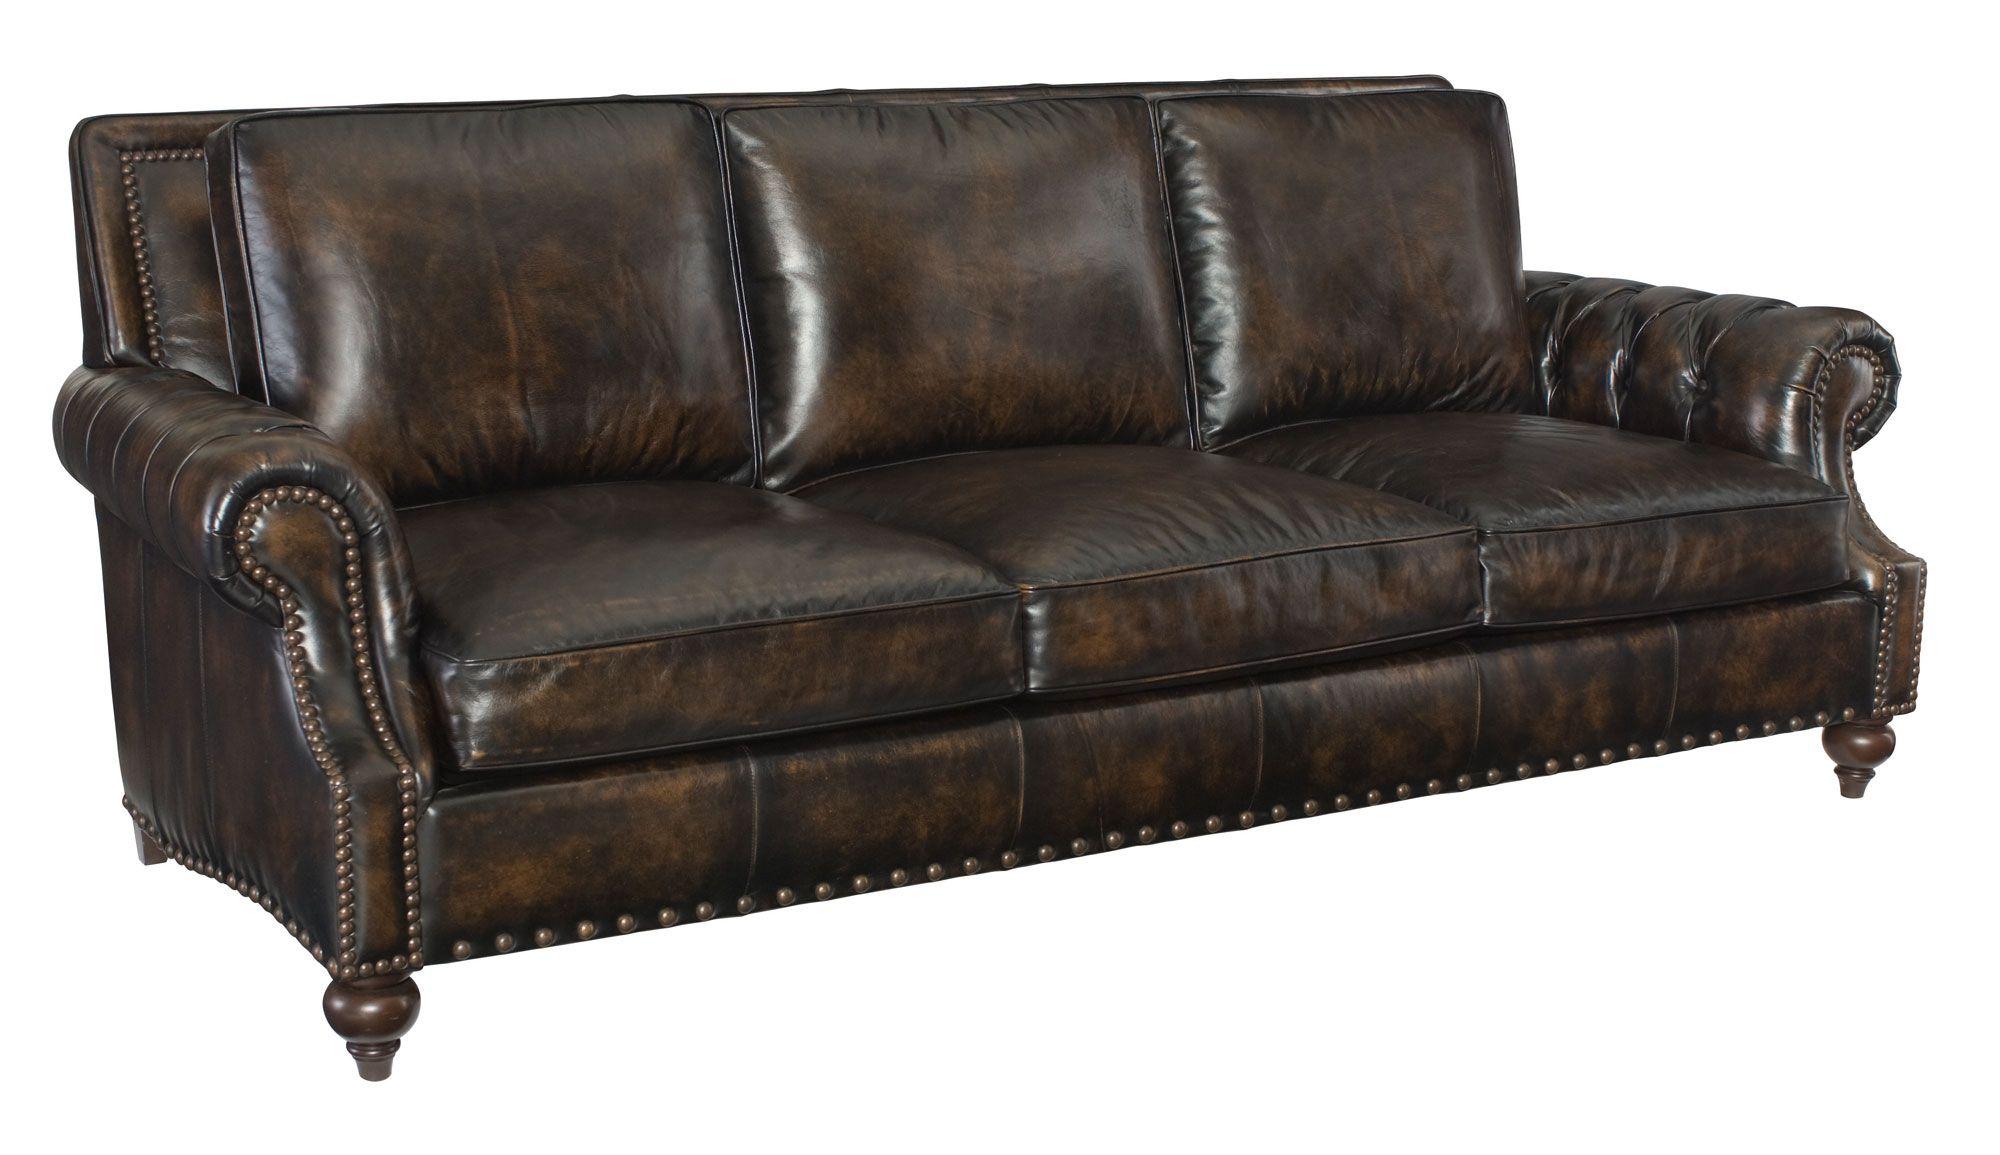 Bernhardt Breckenridge Sofa Sleeper Bed 2077l Nelson W 96 D 40 5 H 36 Sh 18 Ah